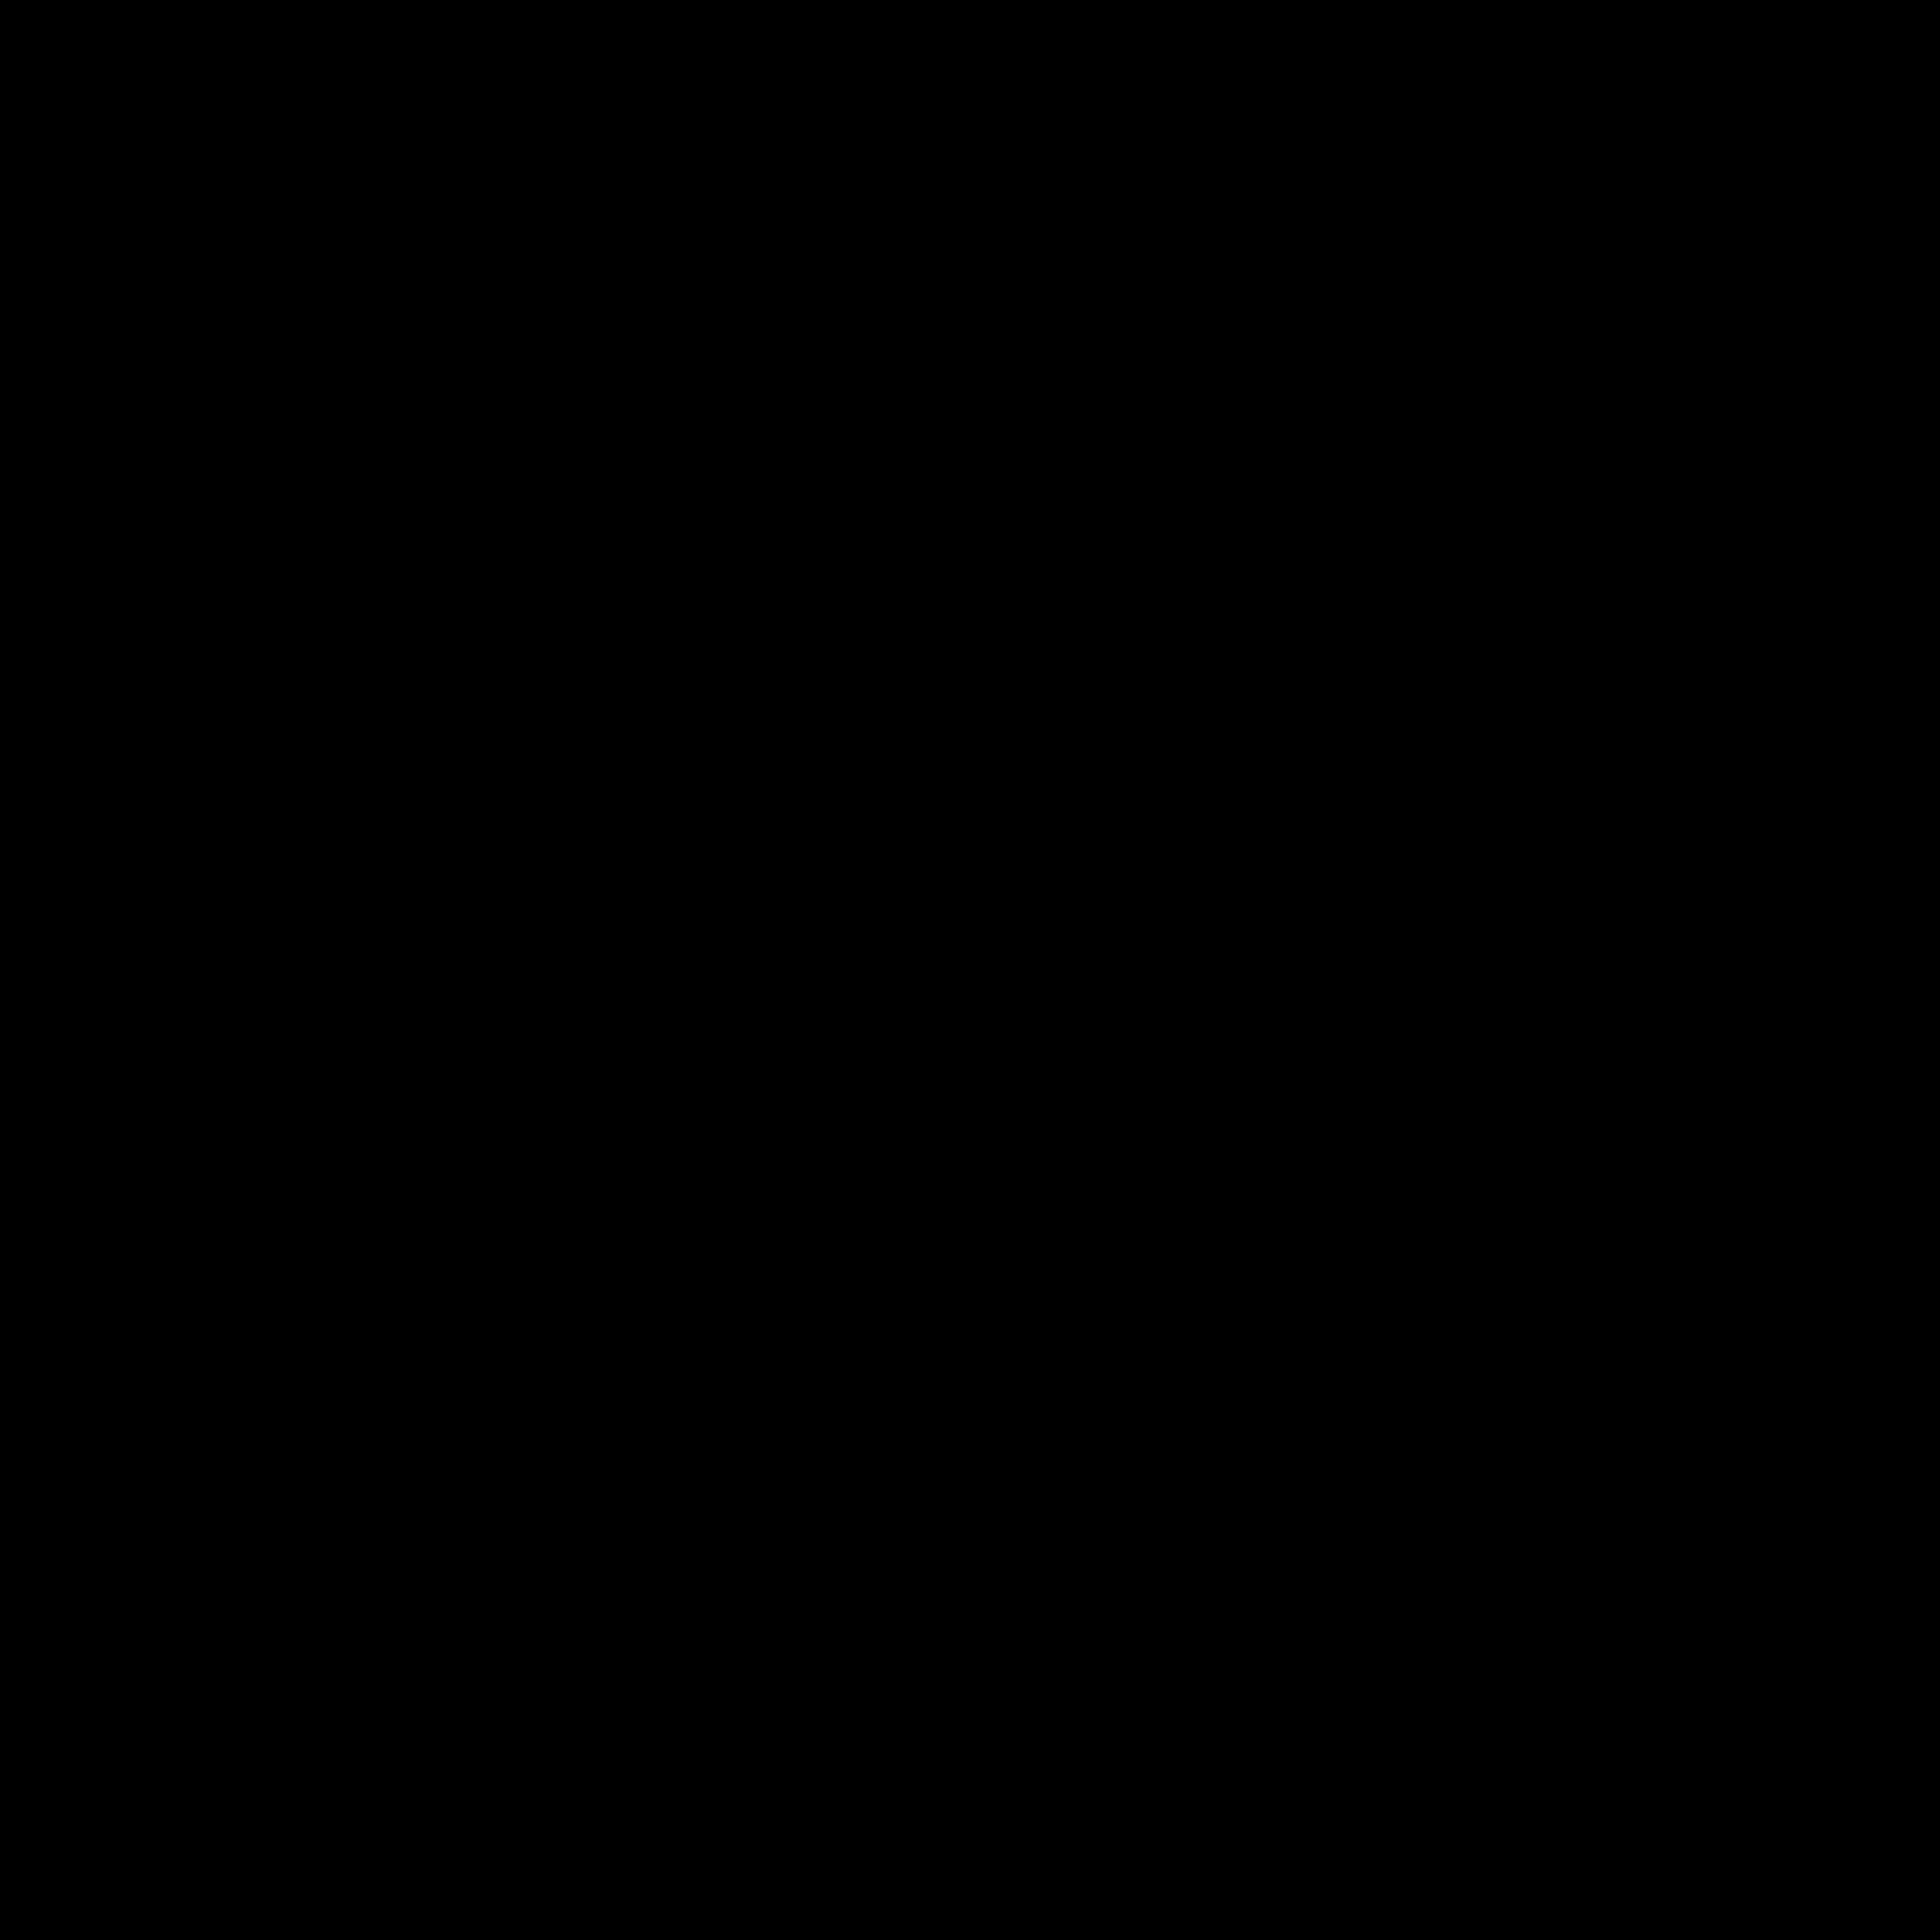 politecnico-di-milano-logo-png-transparent